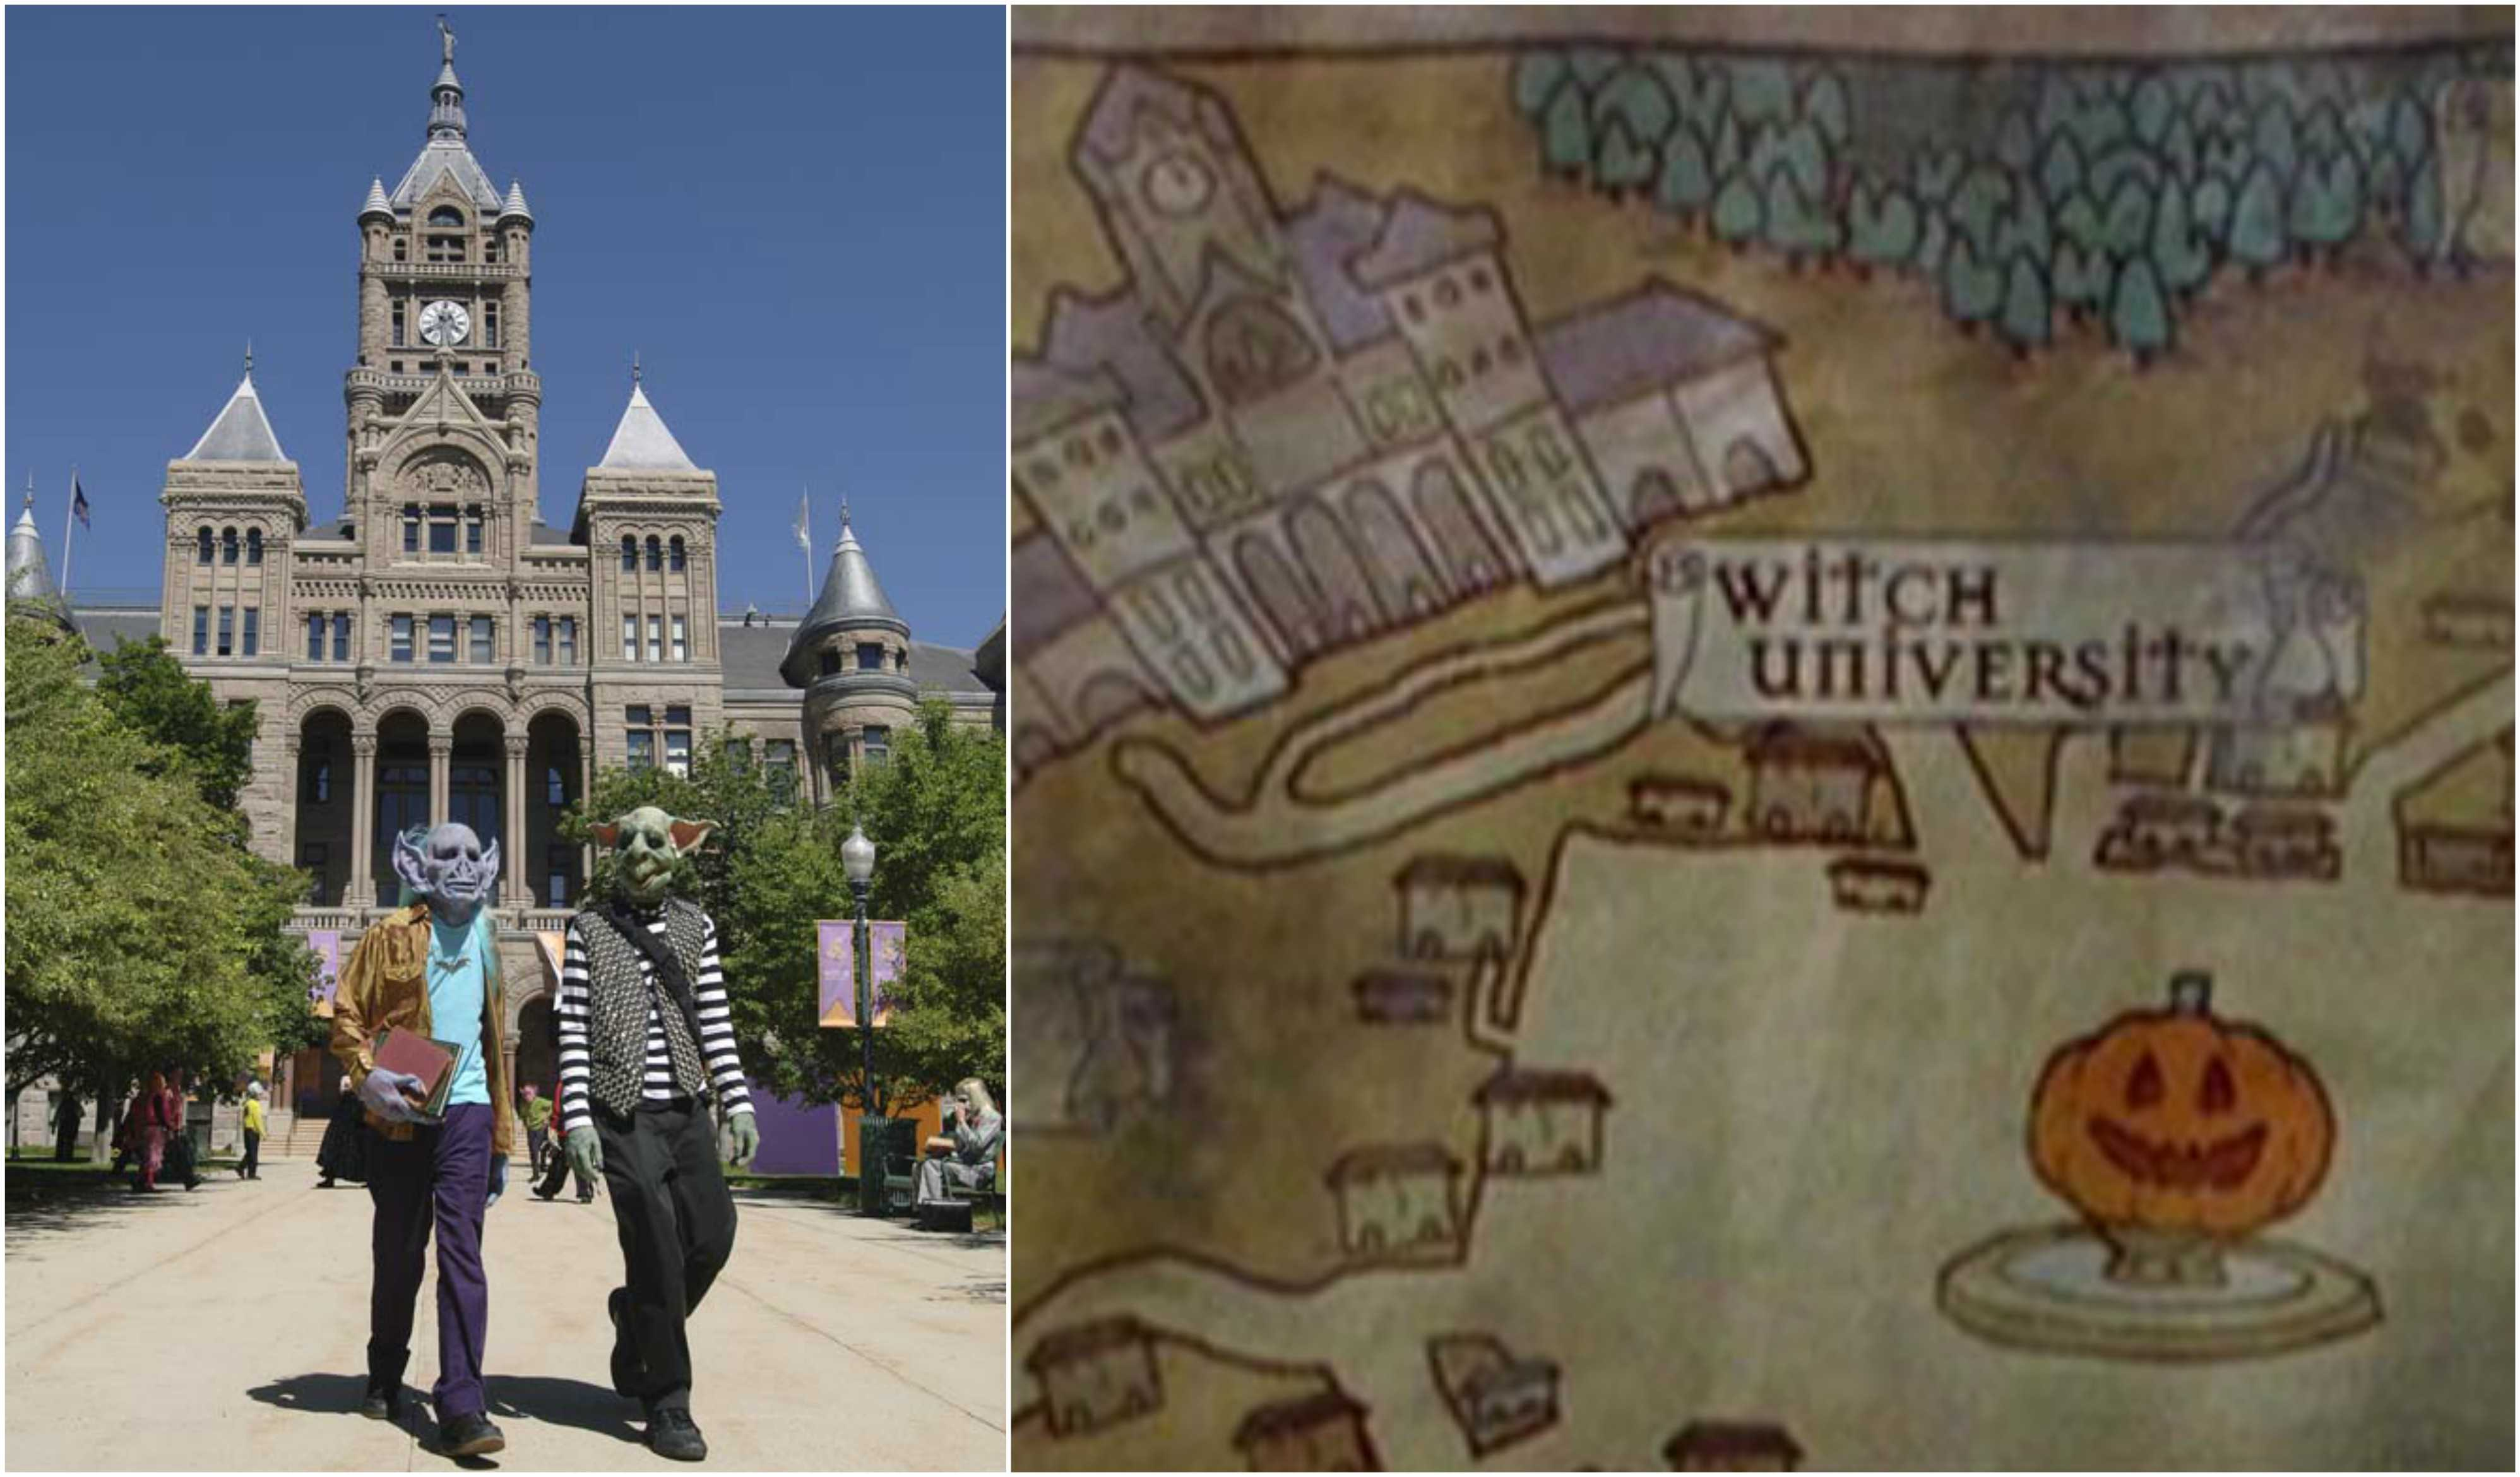 witch university